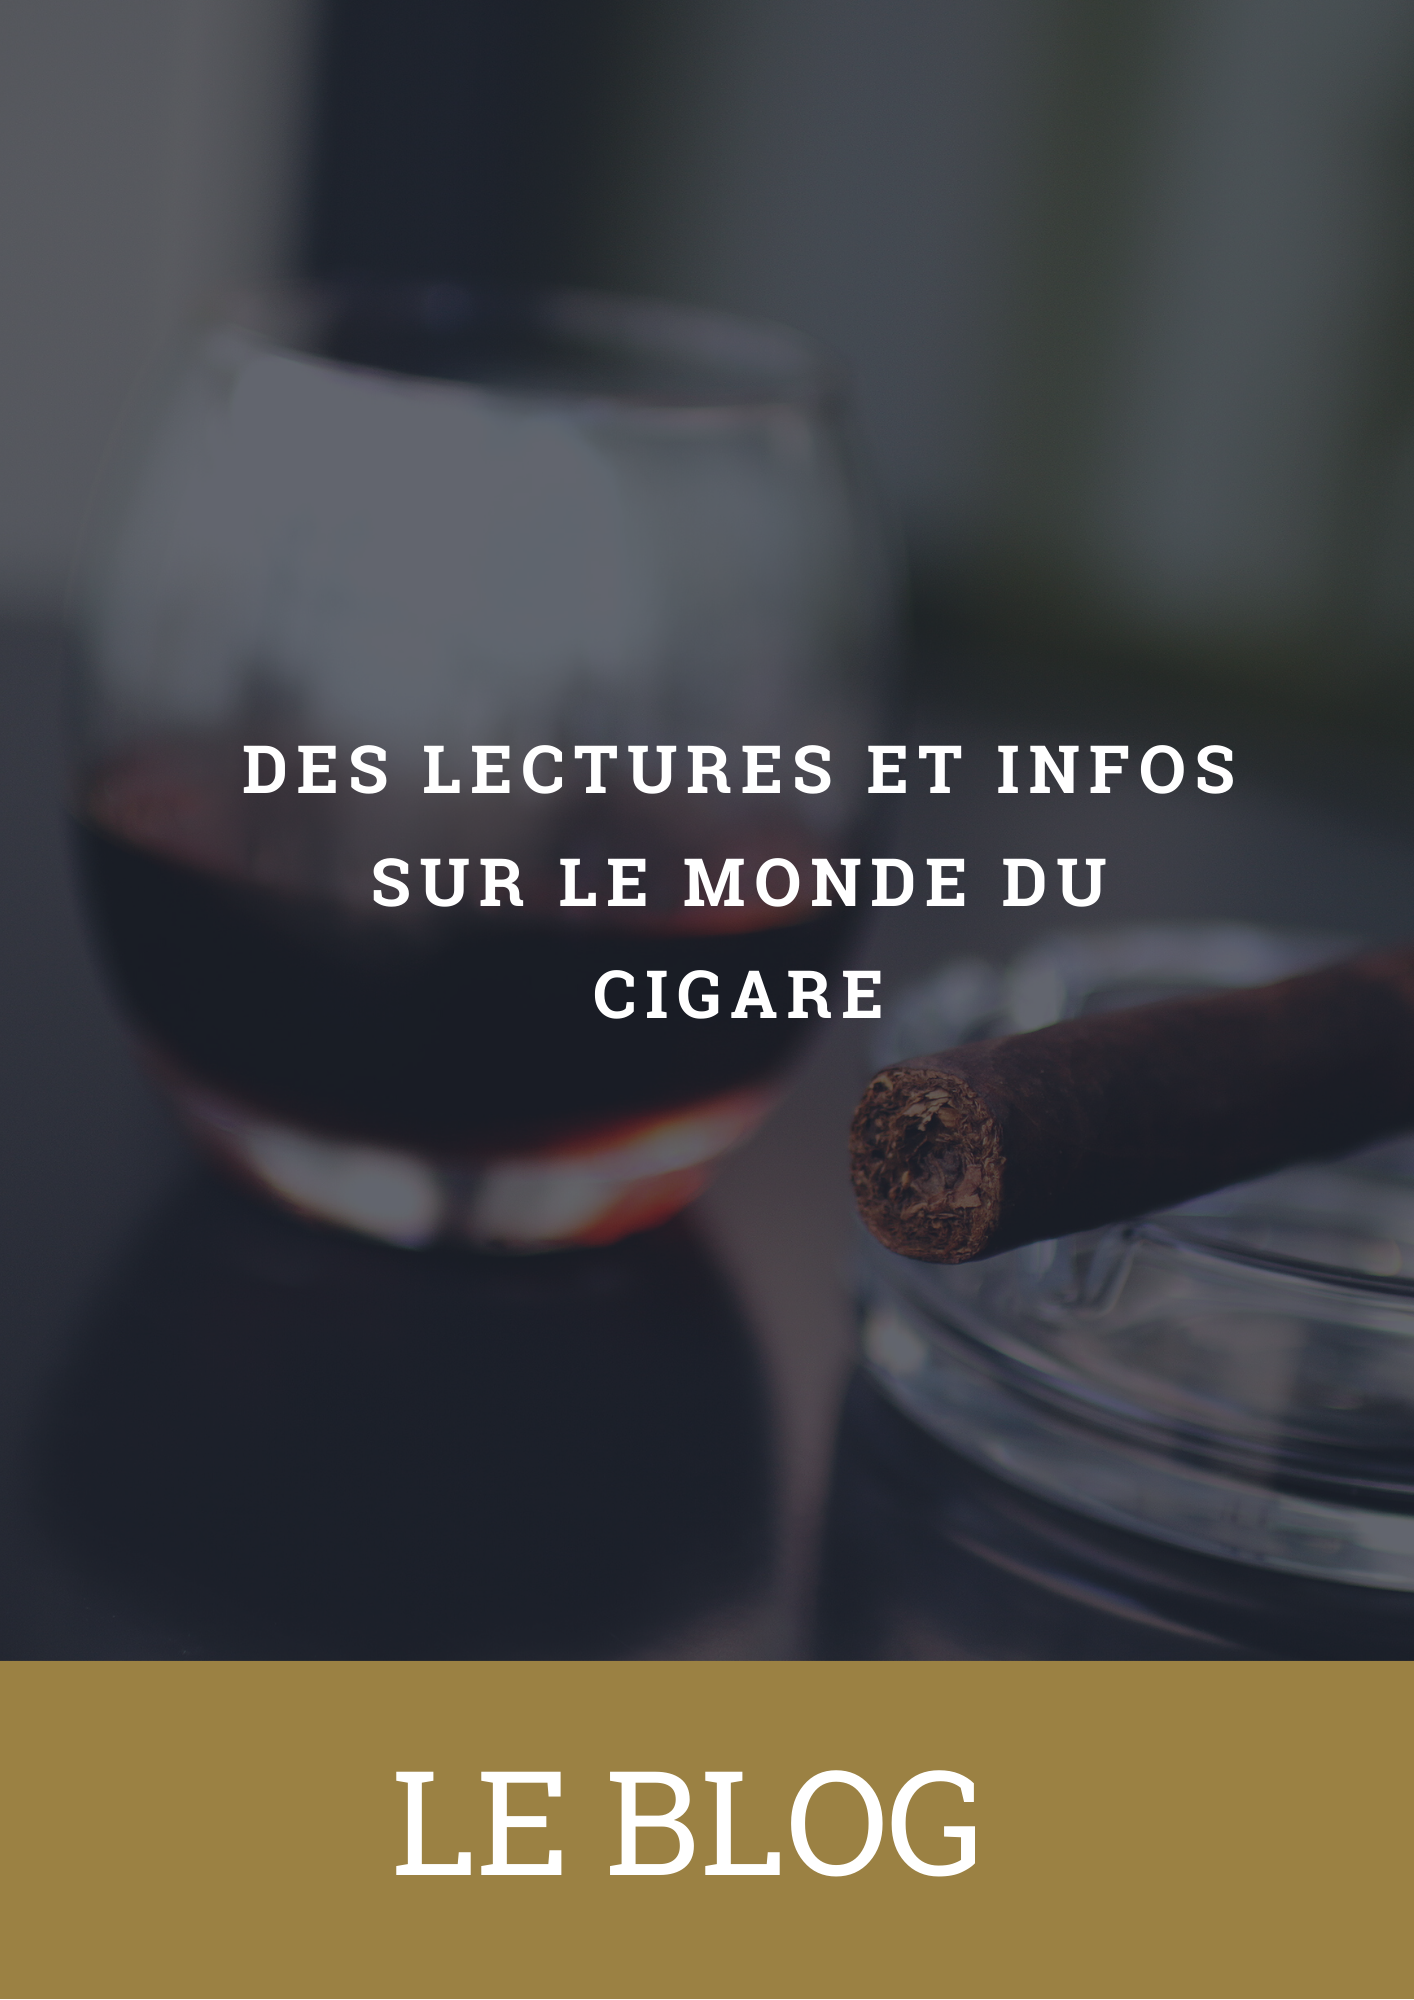 CIGAR SOCIAL - Le Blog